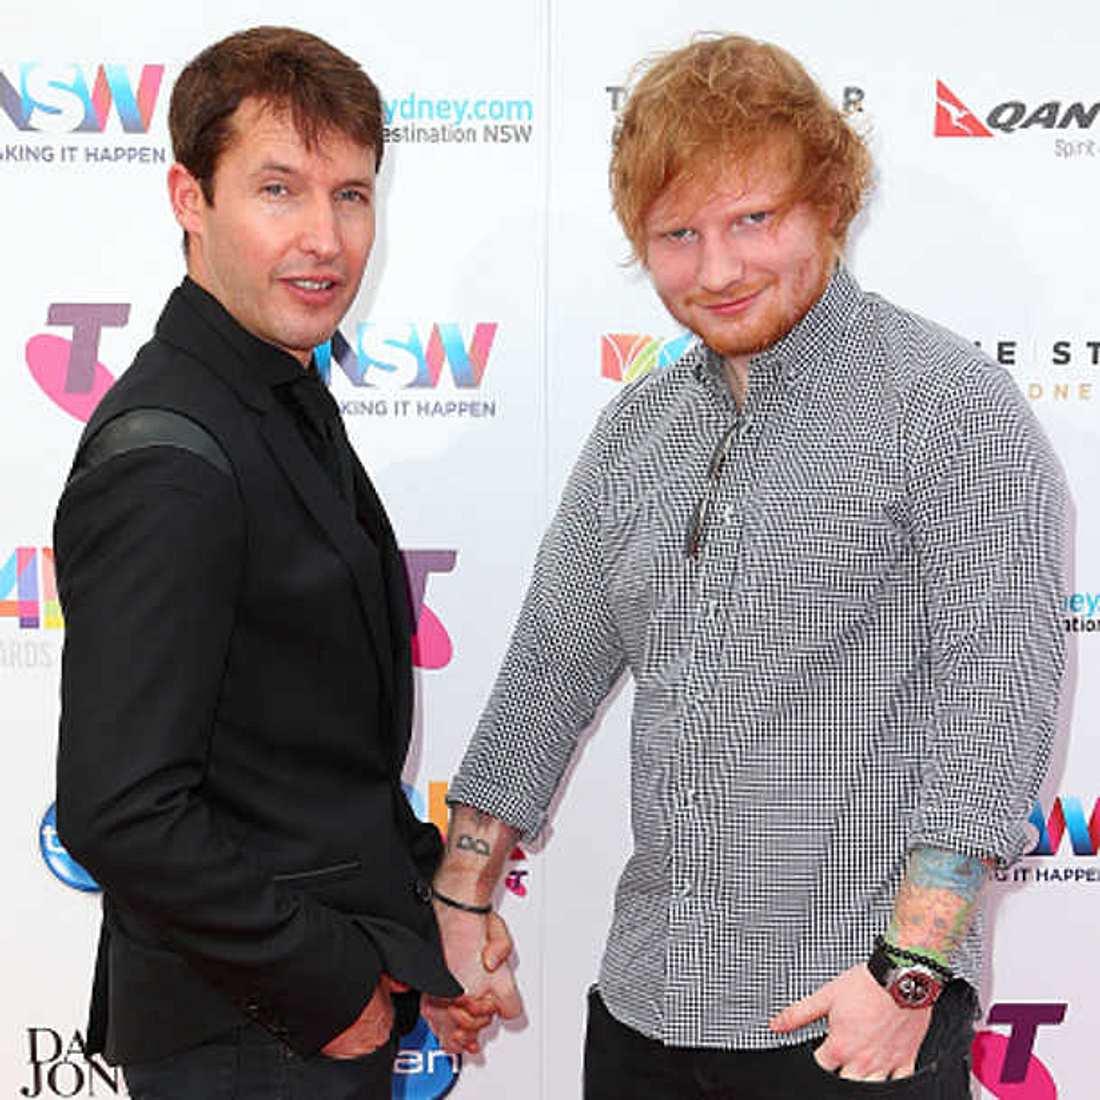 Ed Sheeran James Blunt Verlobung